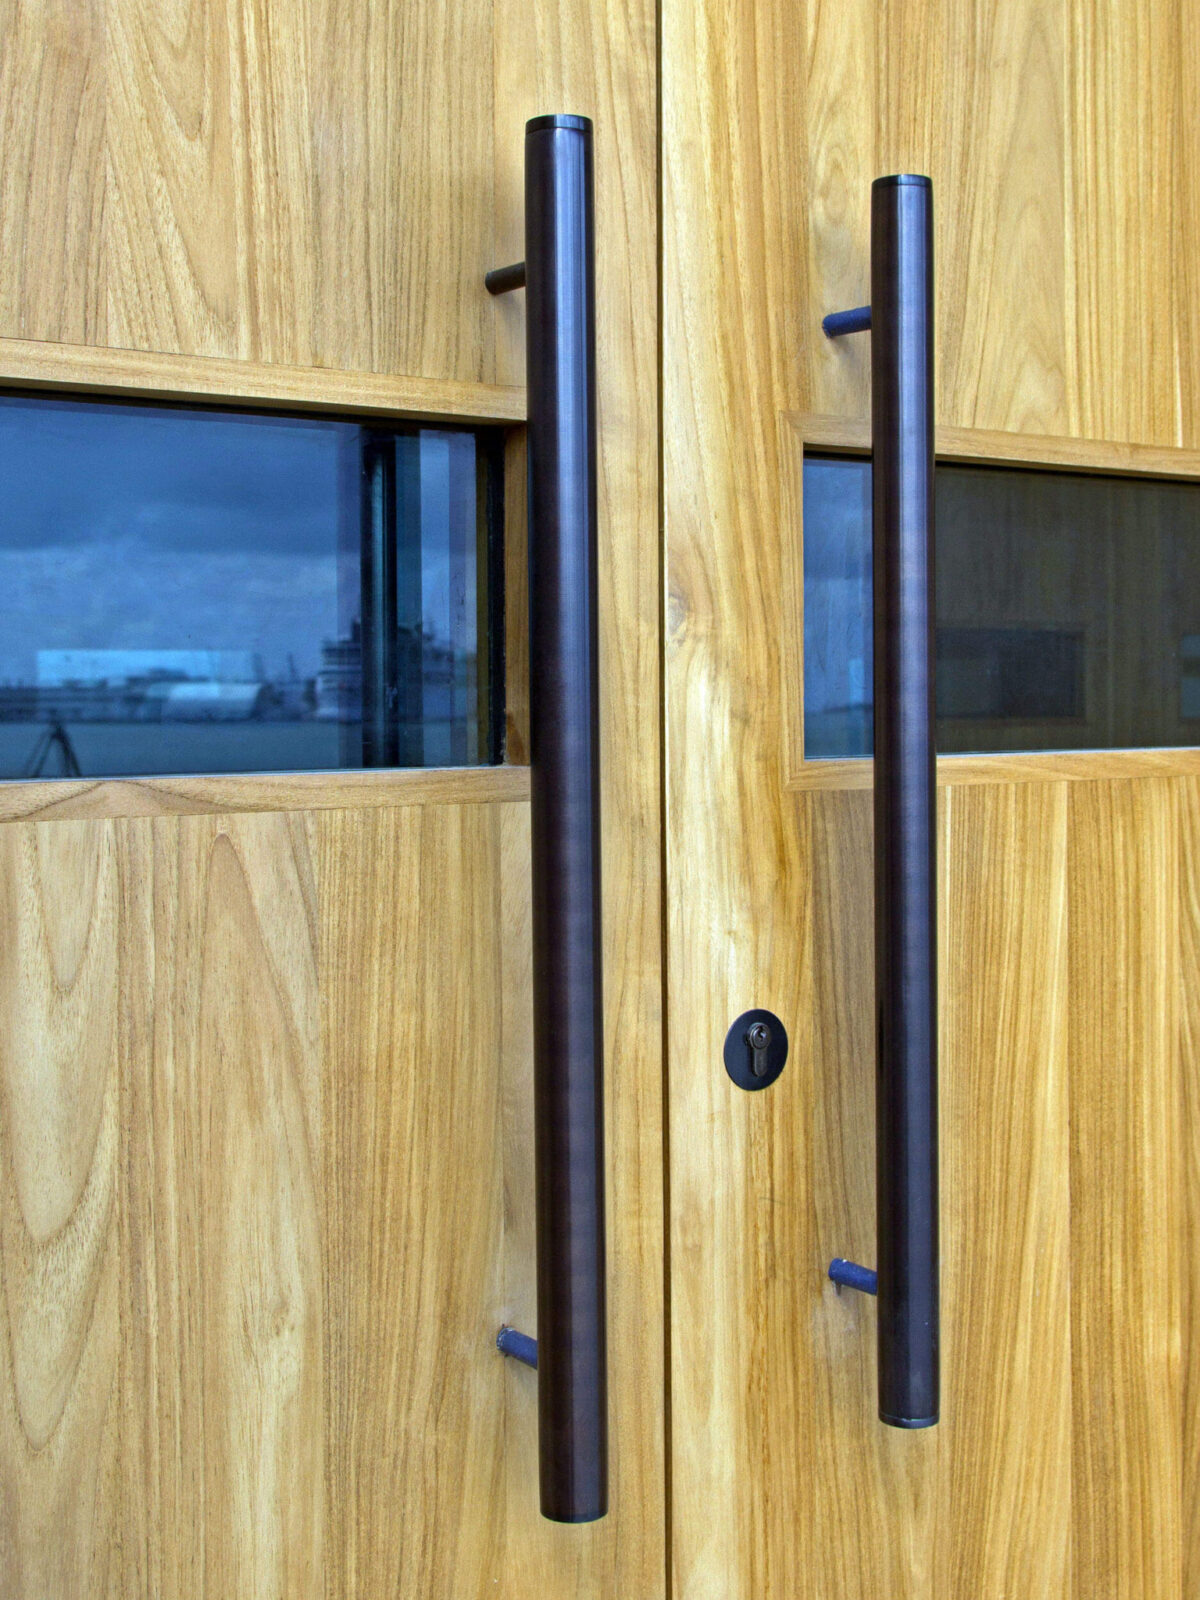 TEAK ENTRANCE DOORS PULL DETAIL.